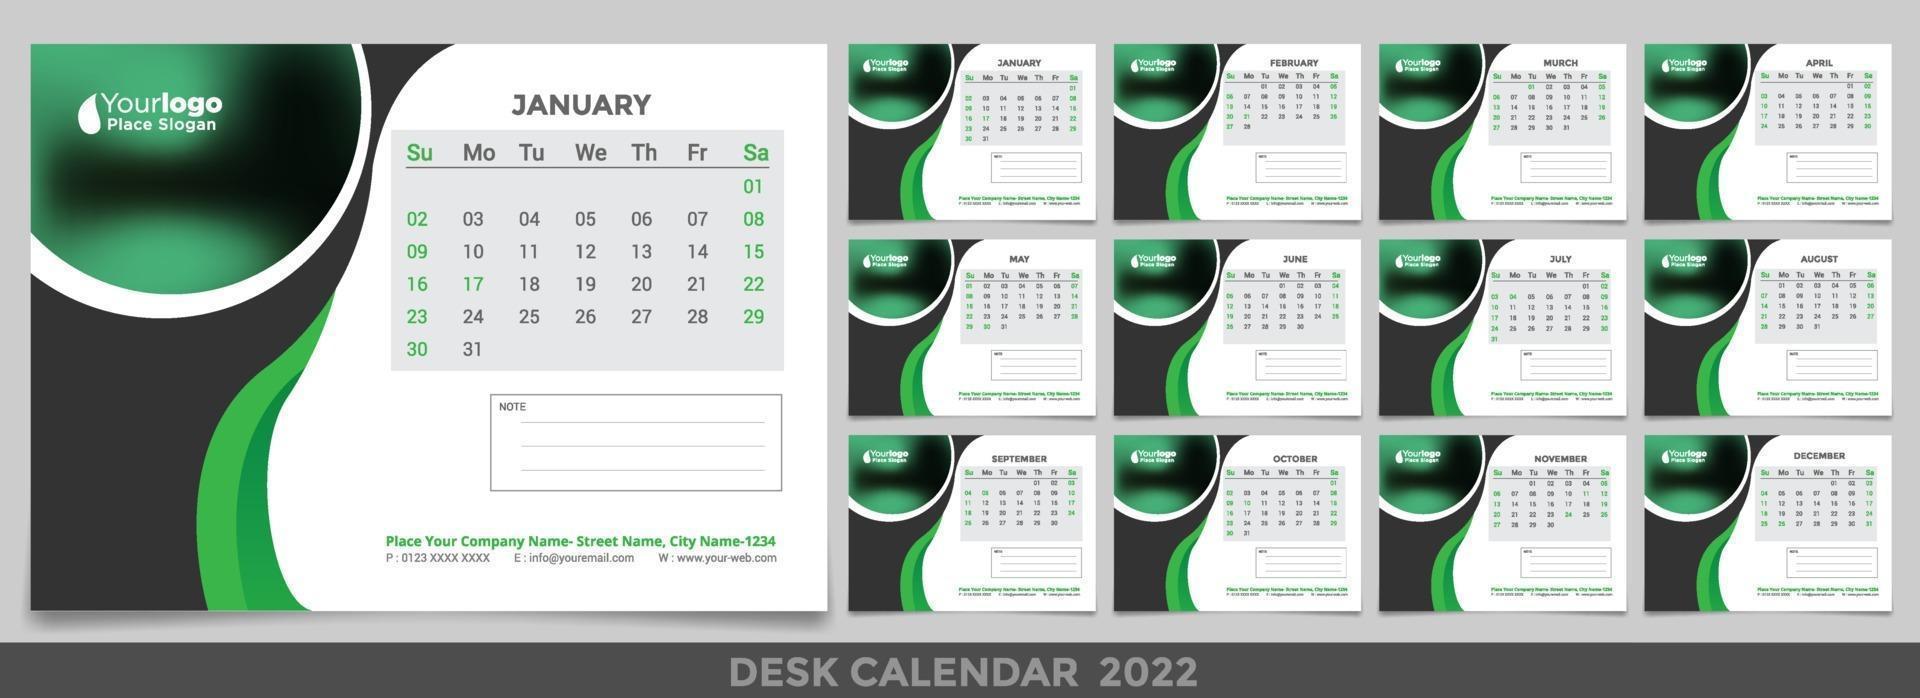 Desk Calendar 2022 Planner Corporate Template Design Set 2971469 Vector Art At Vecteezy